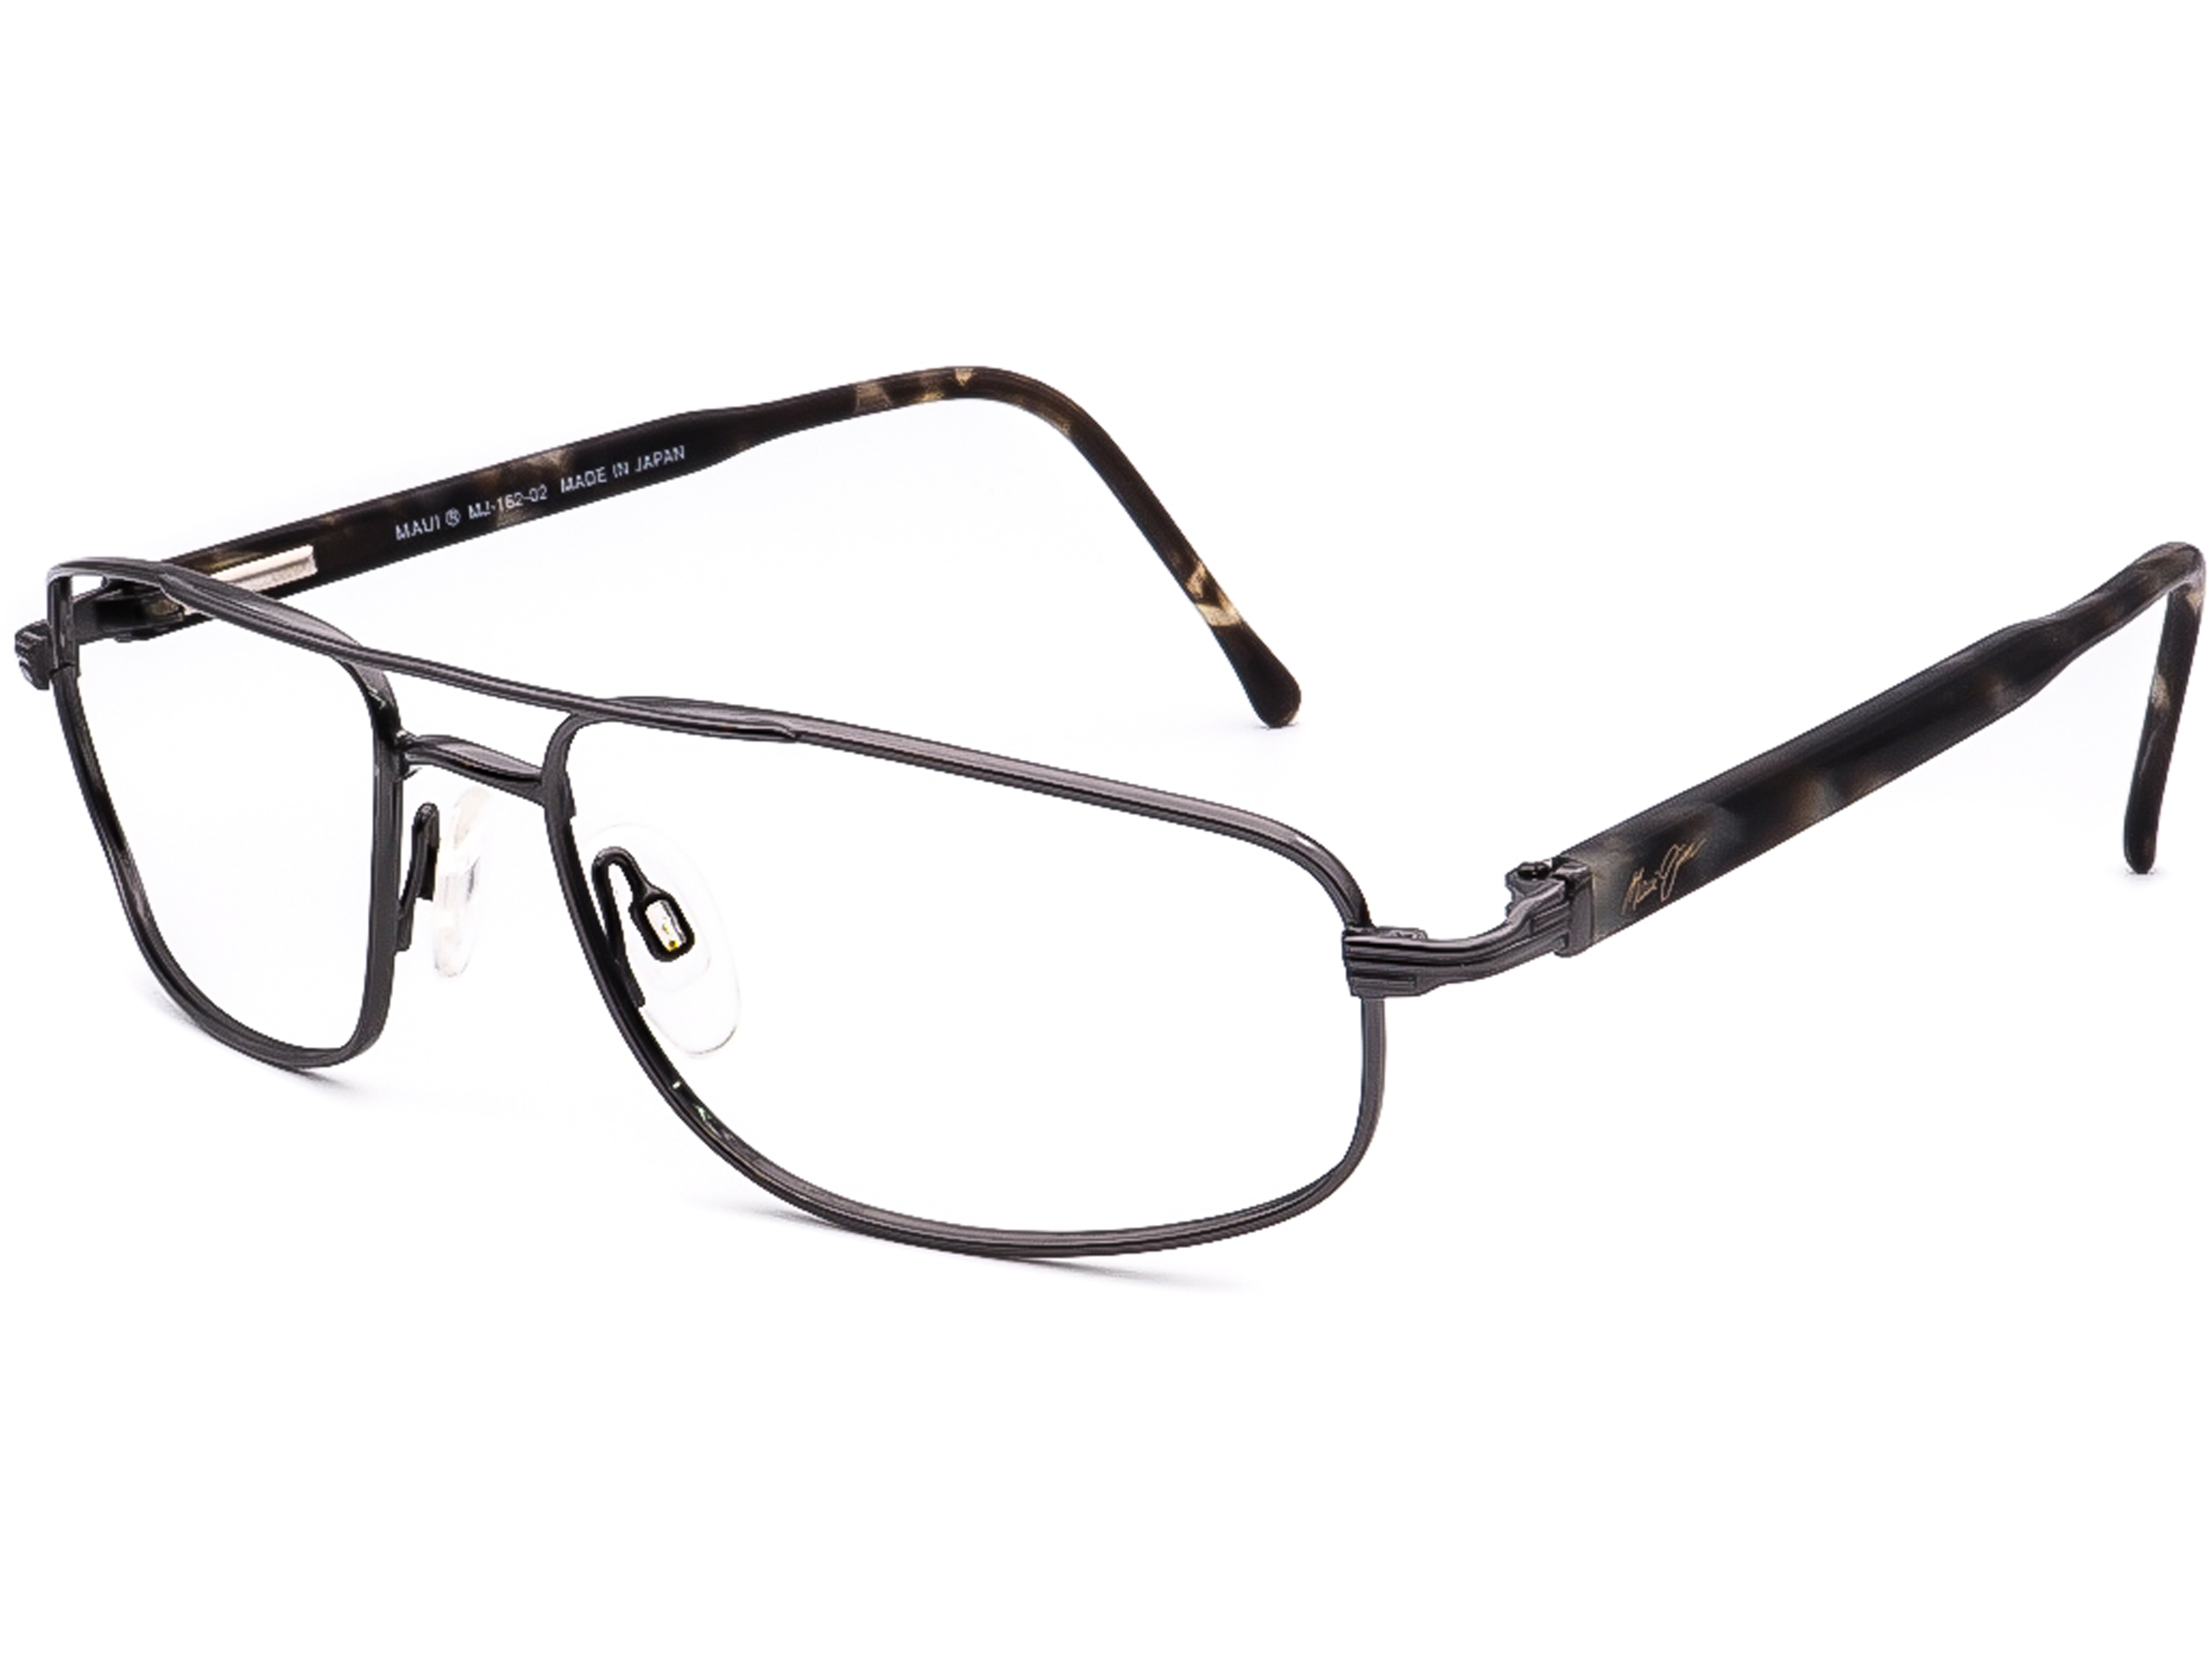 Maui Jim Women/'s Sunglasses Frame Only MJ-162-02 Gunmetal Pilot Japan 60 mm